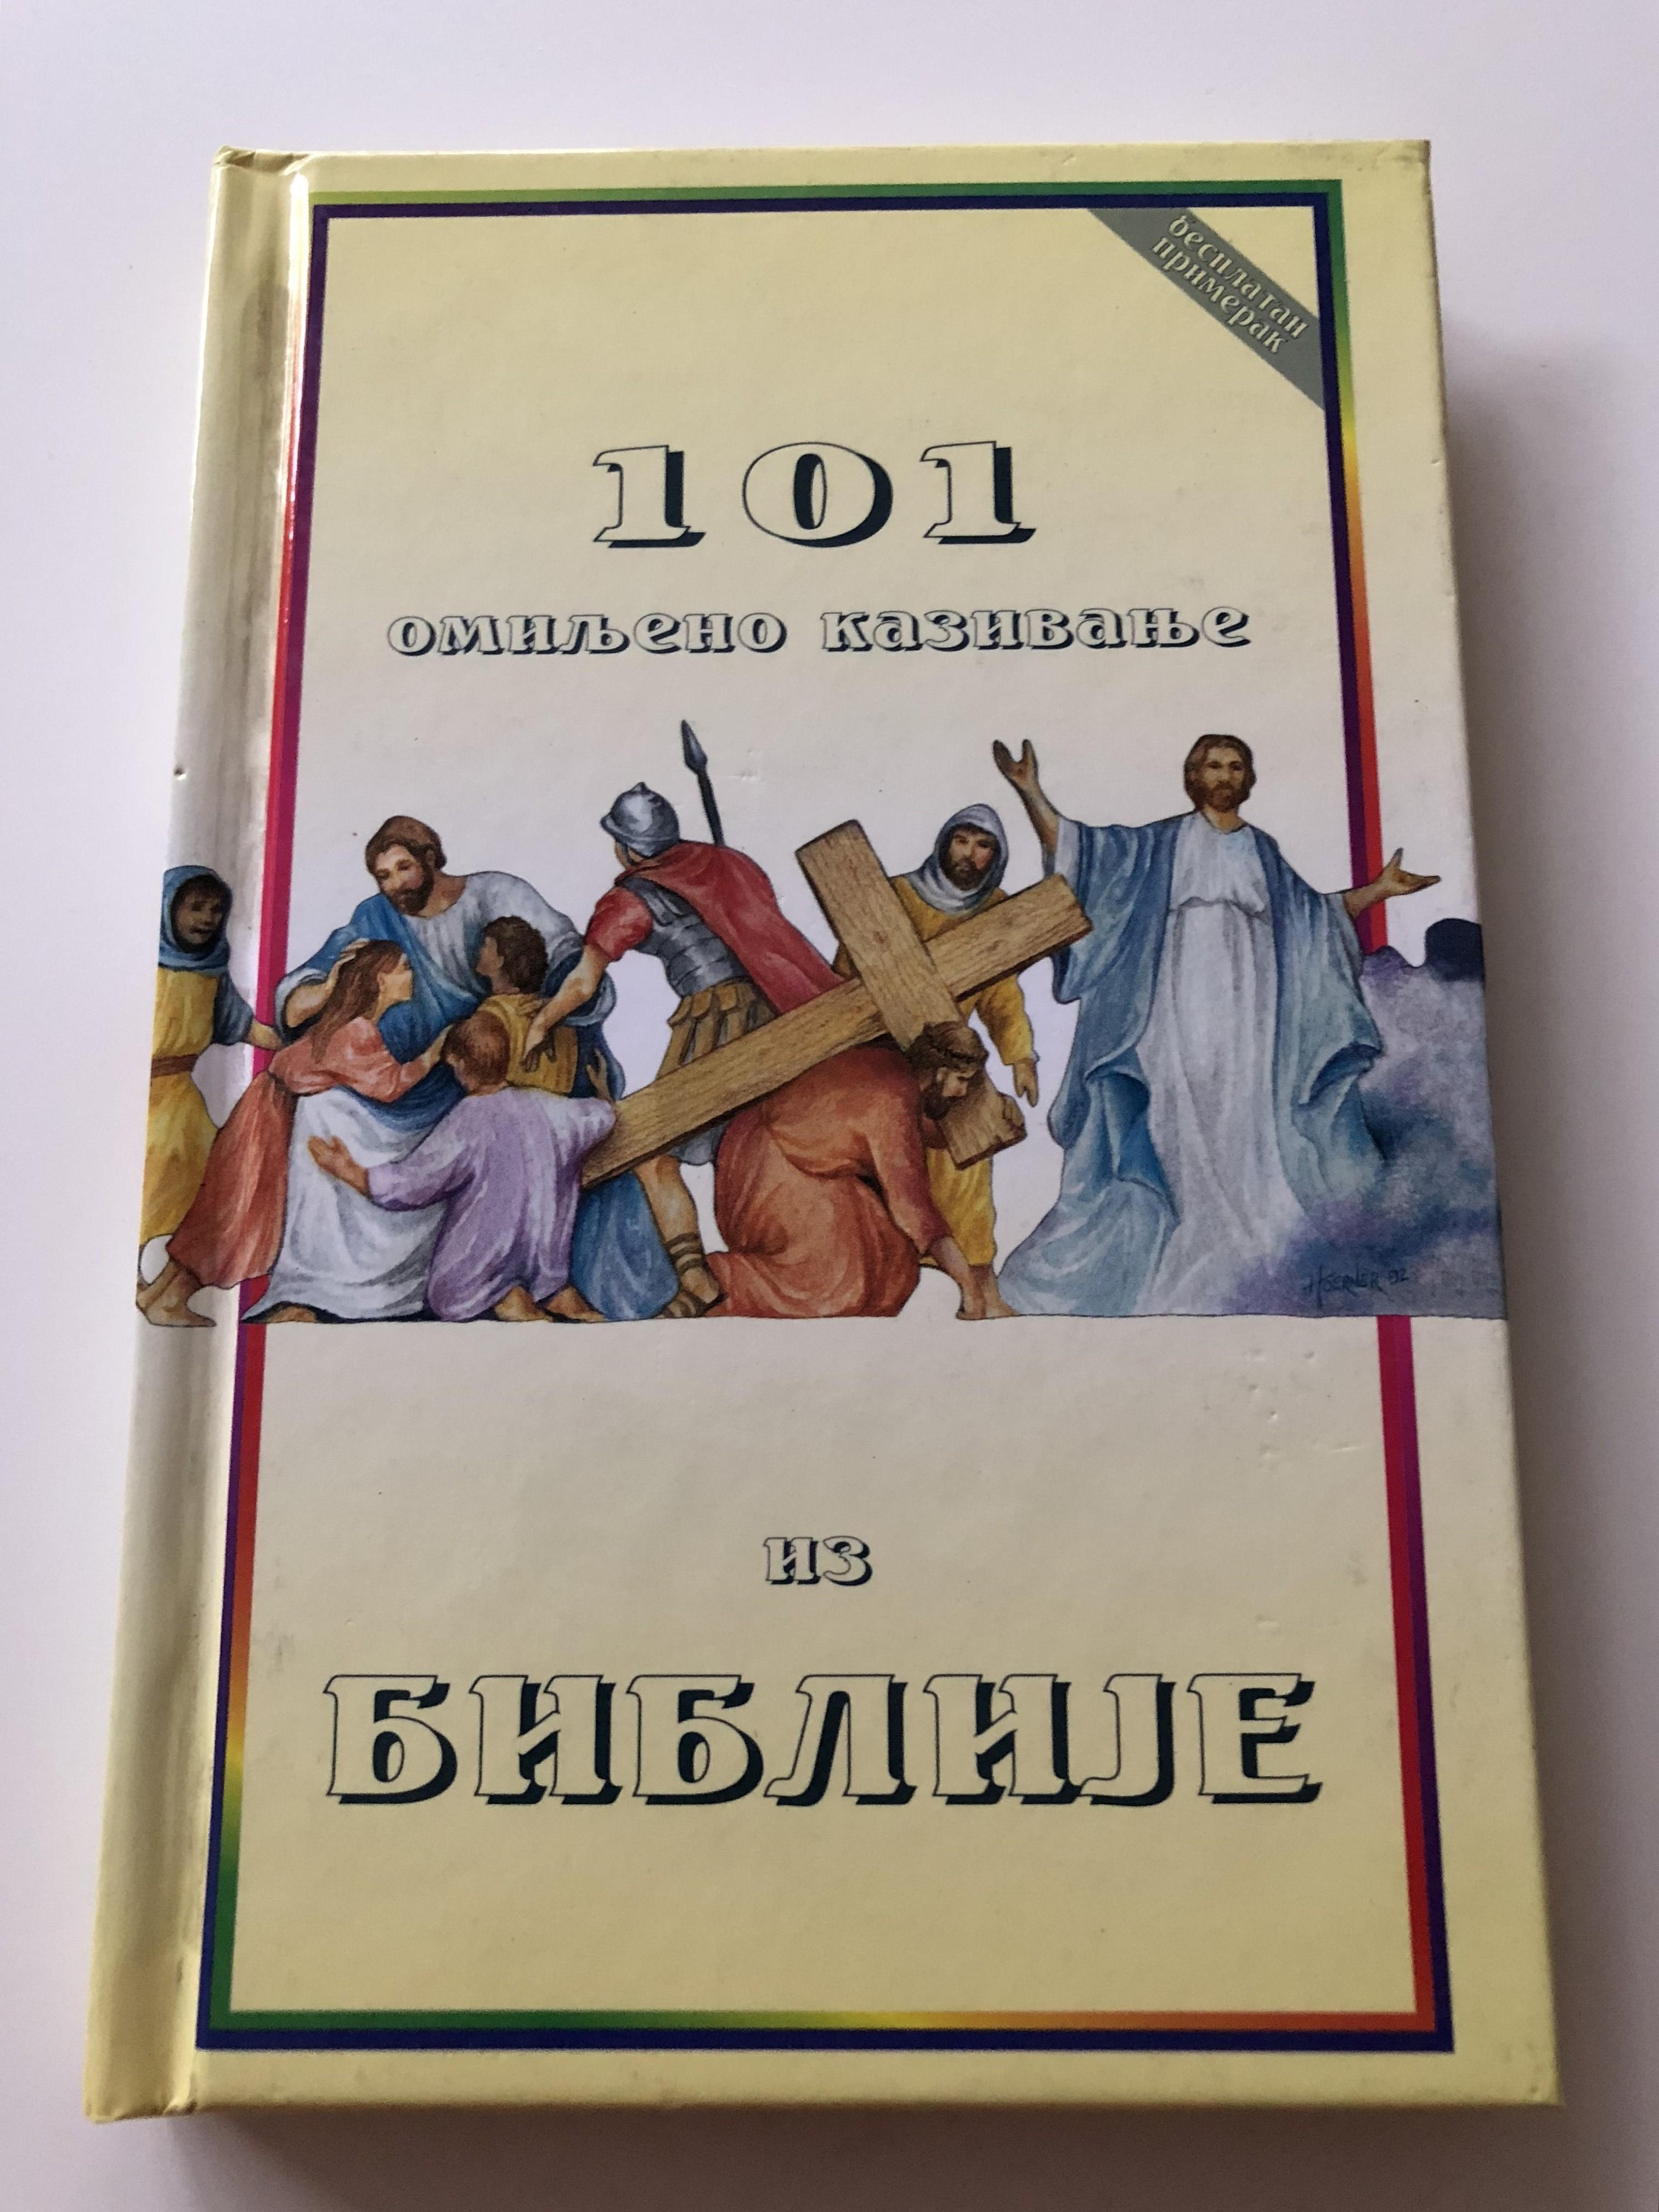 1.-serbian101favstoriesfrombible.jpg